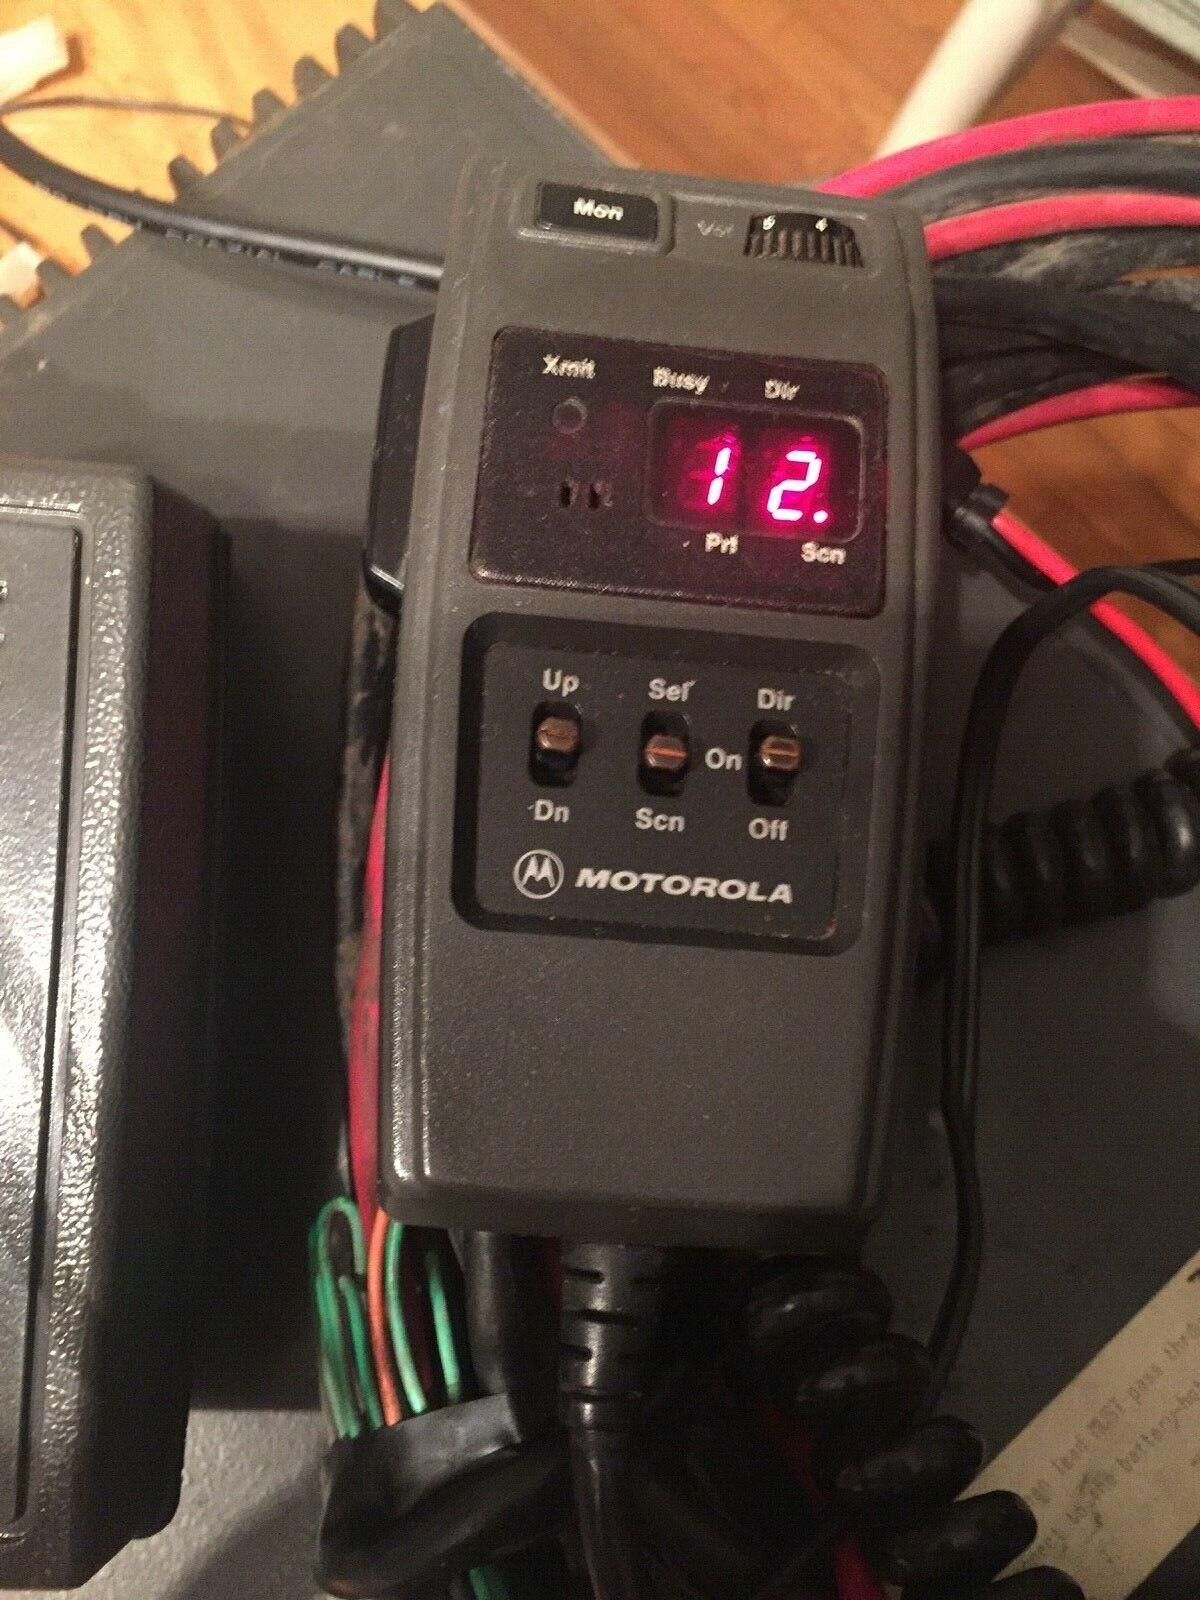 Motorola T81XTA7TA5BK Maratrac 100 Watt VHF Low Band 99 Channel Radio w HCN1051A. Buy it now for 79.00